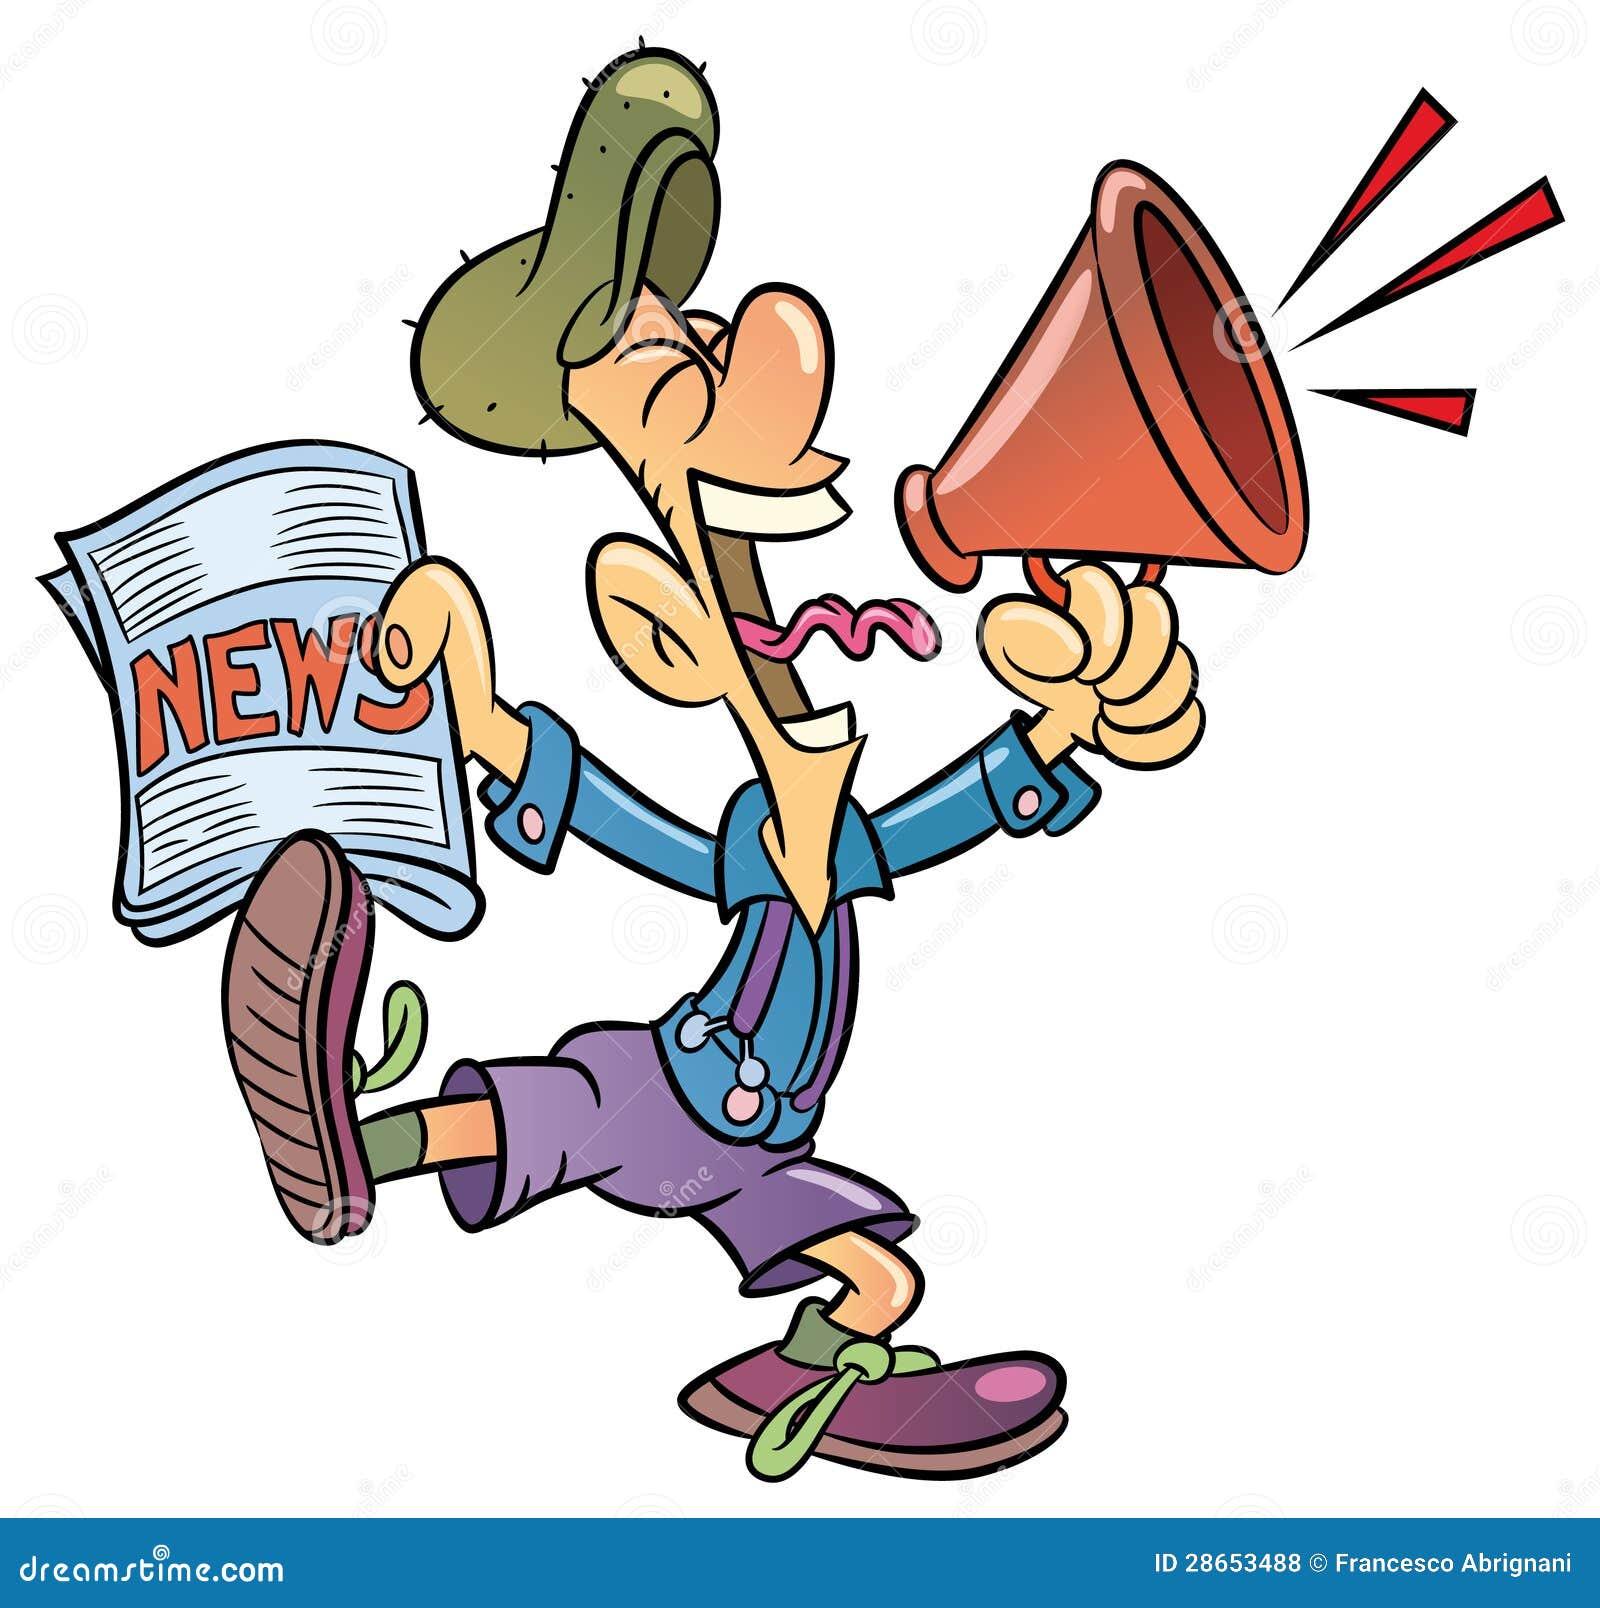 paperboy royalty free stock photos image 28653488 Cheerleading Megaphone Clip Art Printable Cheerleading Megaphone Clip Art Printable